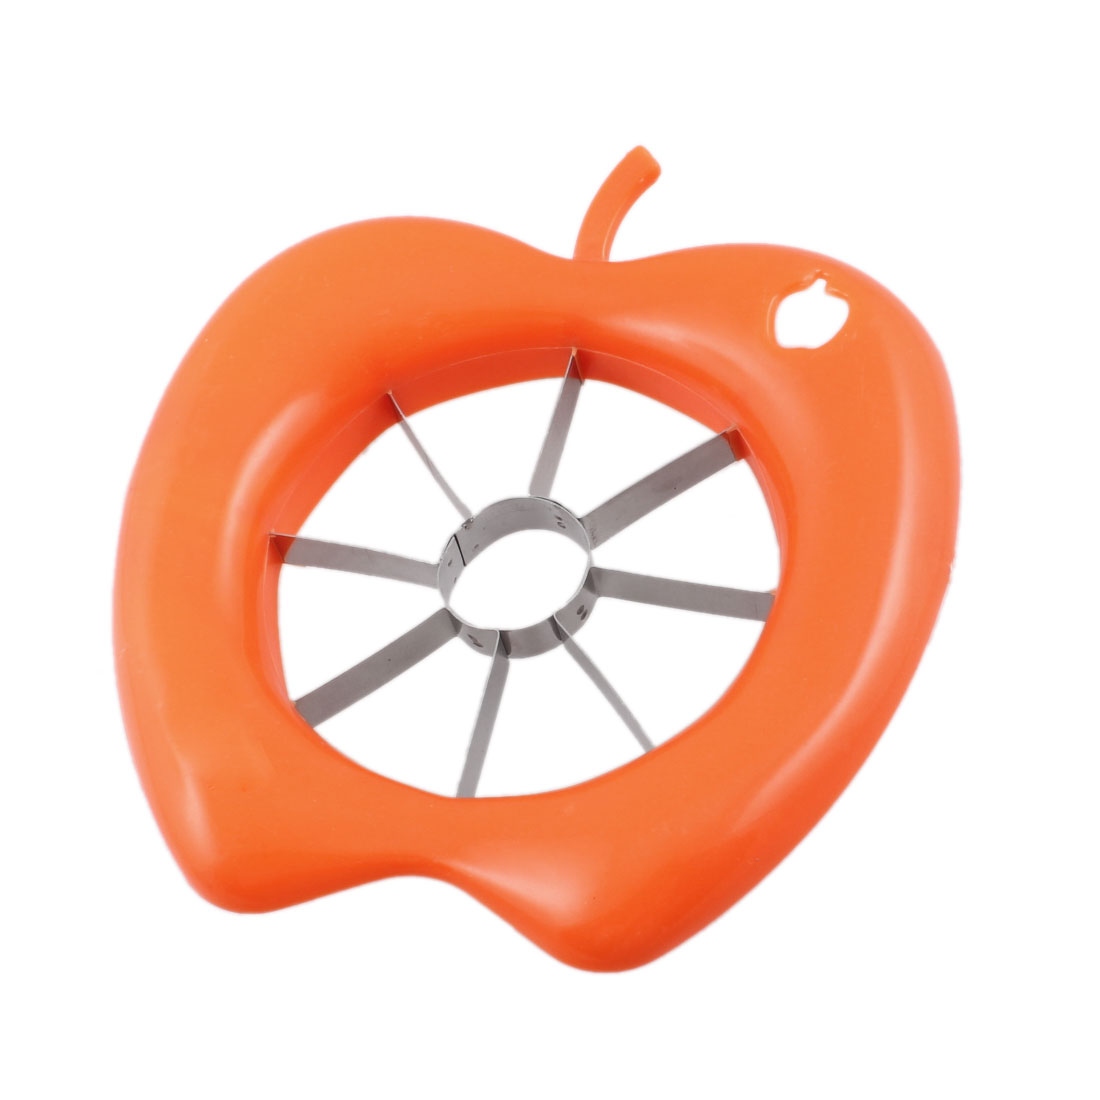 Orange Plastic Shell Sharp Cutting Part Apple Piler Slicer Cutter Corer